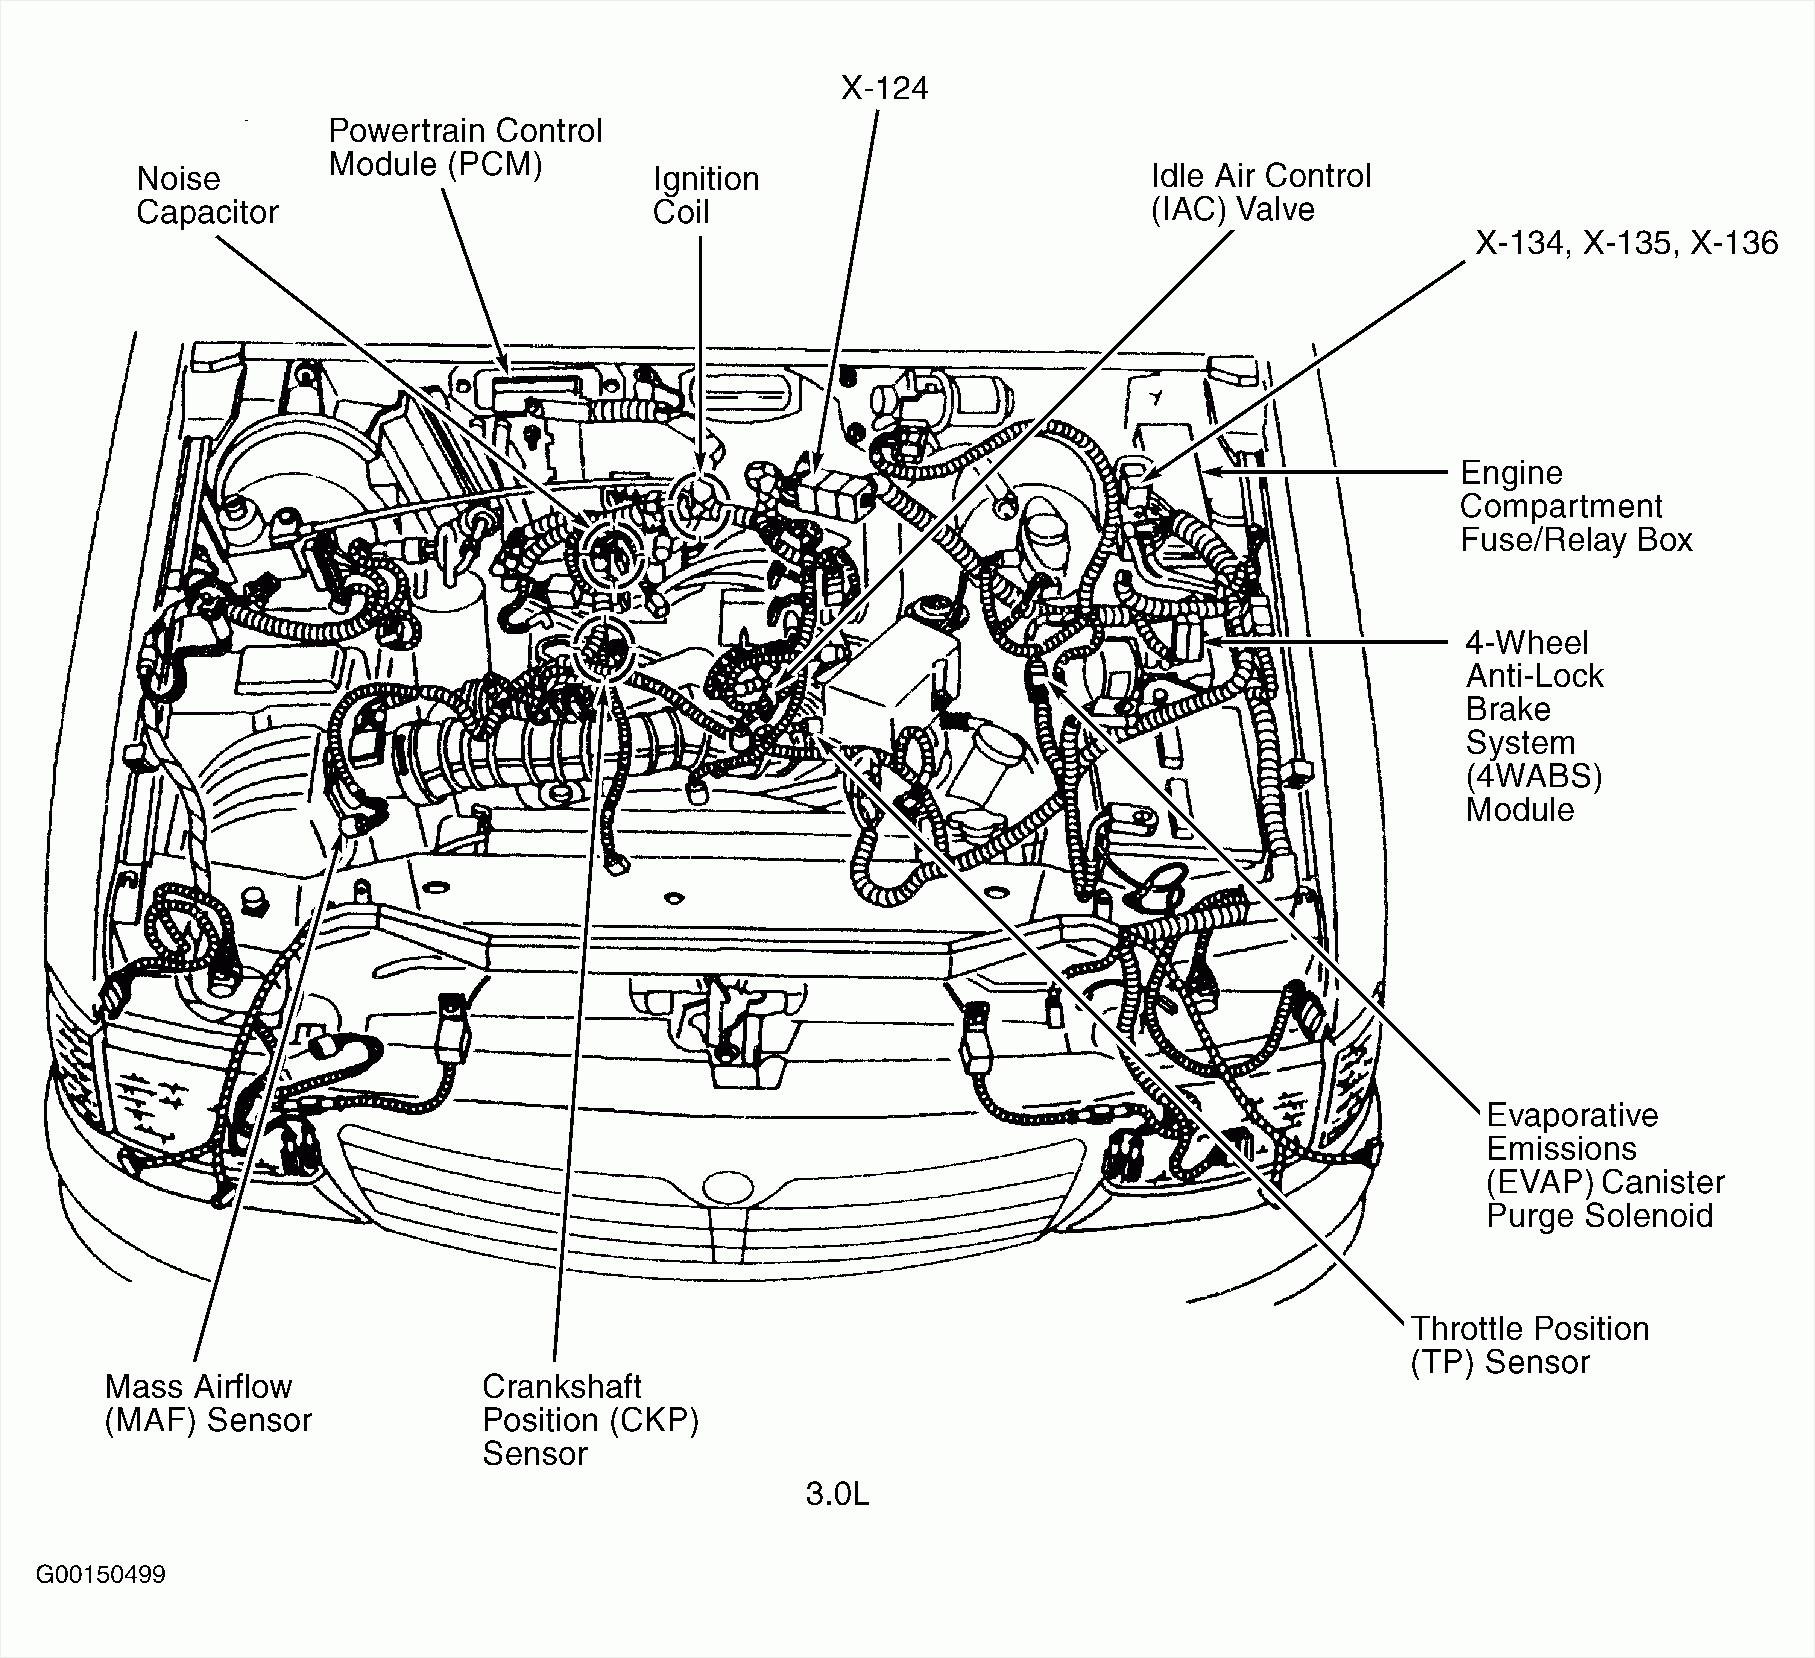 Pontiac Grand Am Engine Diagram 2004 Mazda Mpv Parts Diagram Wiring Diagram Show Of Pontiac Grand Am Engine Diagram Pontiac 2 4 Engine Diagram Intake Manifold Wiring Diagram Dash